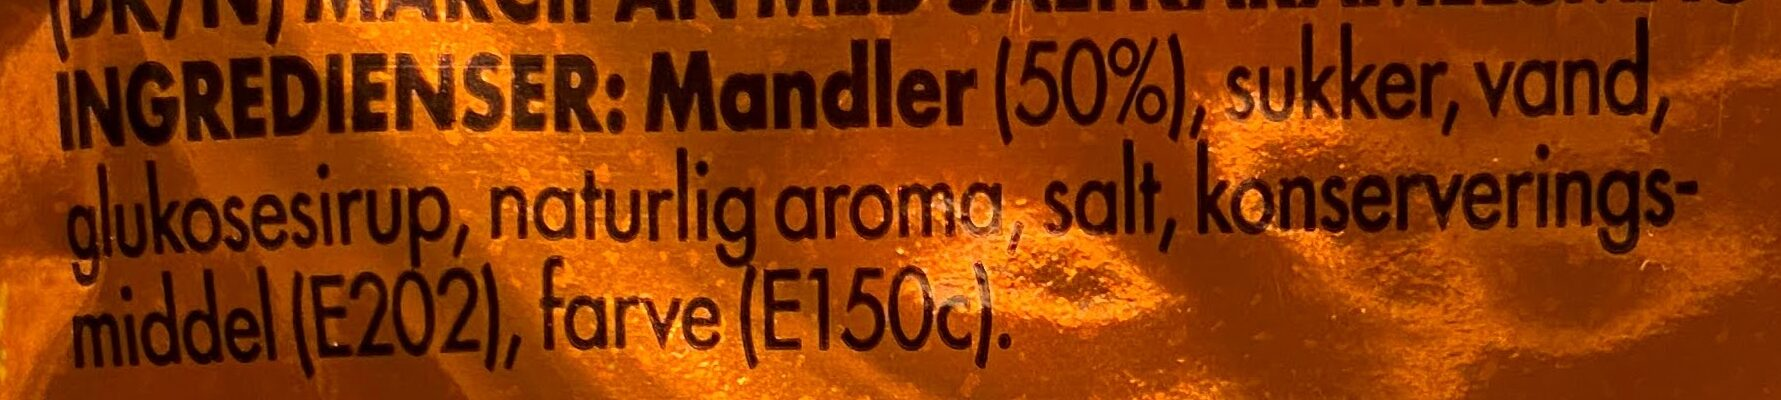 Odense Marsipan Salt Karamell - Ingrédients - en